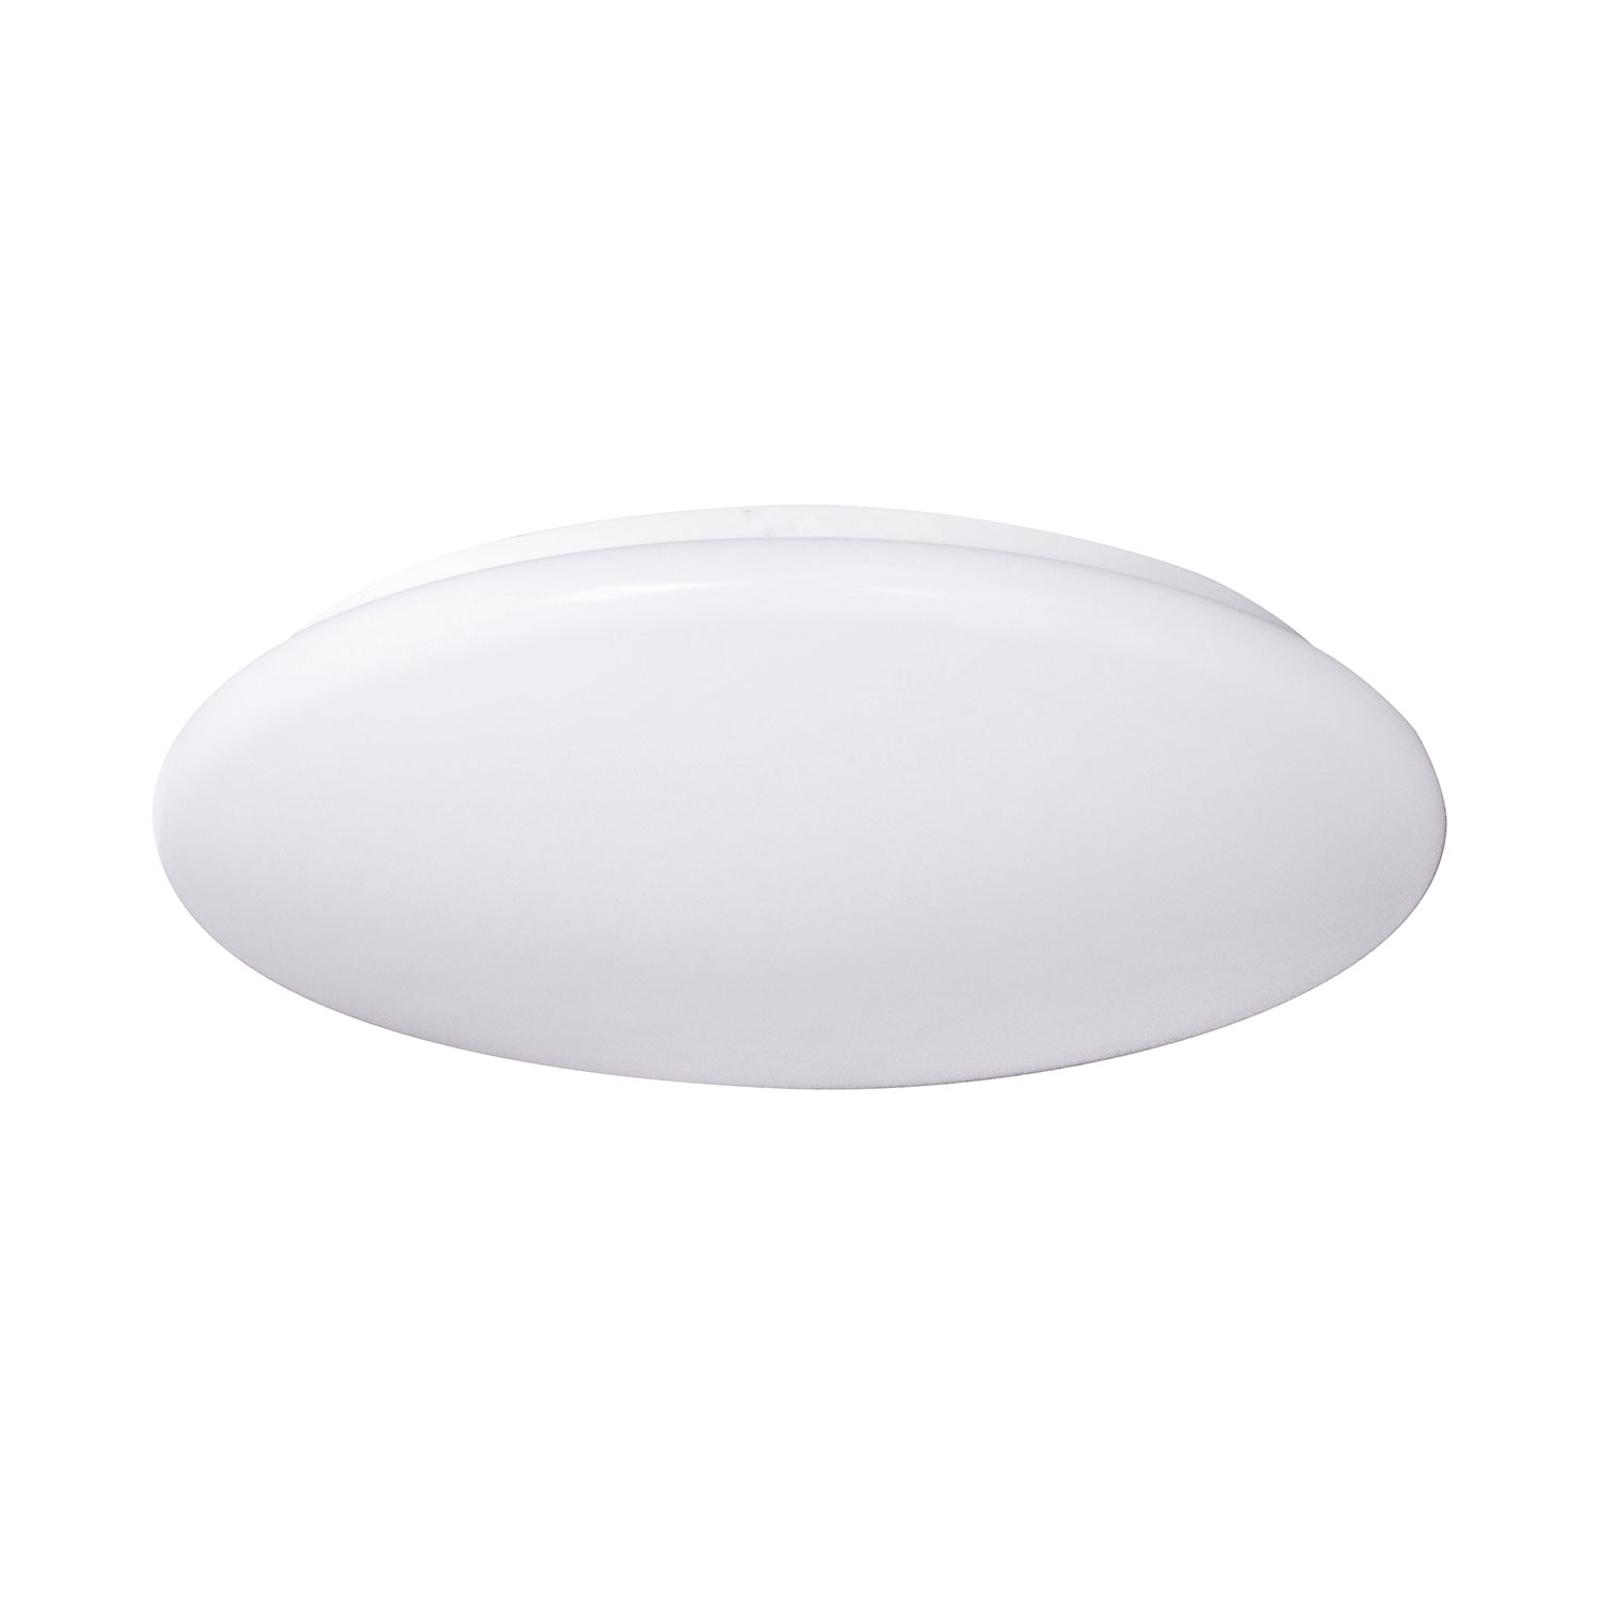 Plafoniera LED Porz IP44 sensore HF, bianco